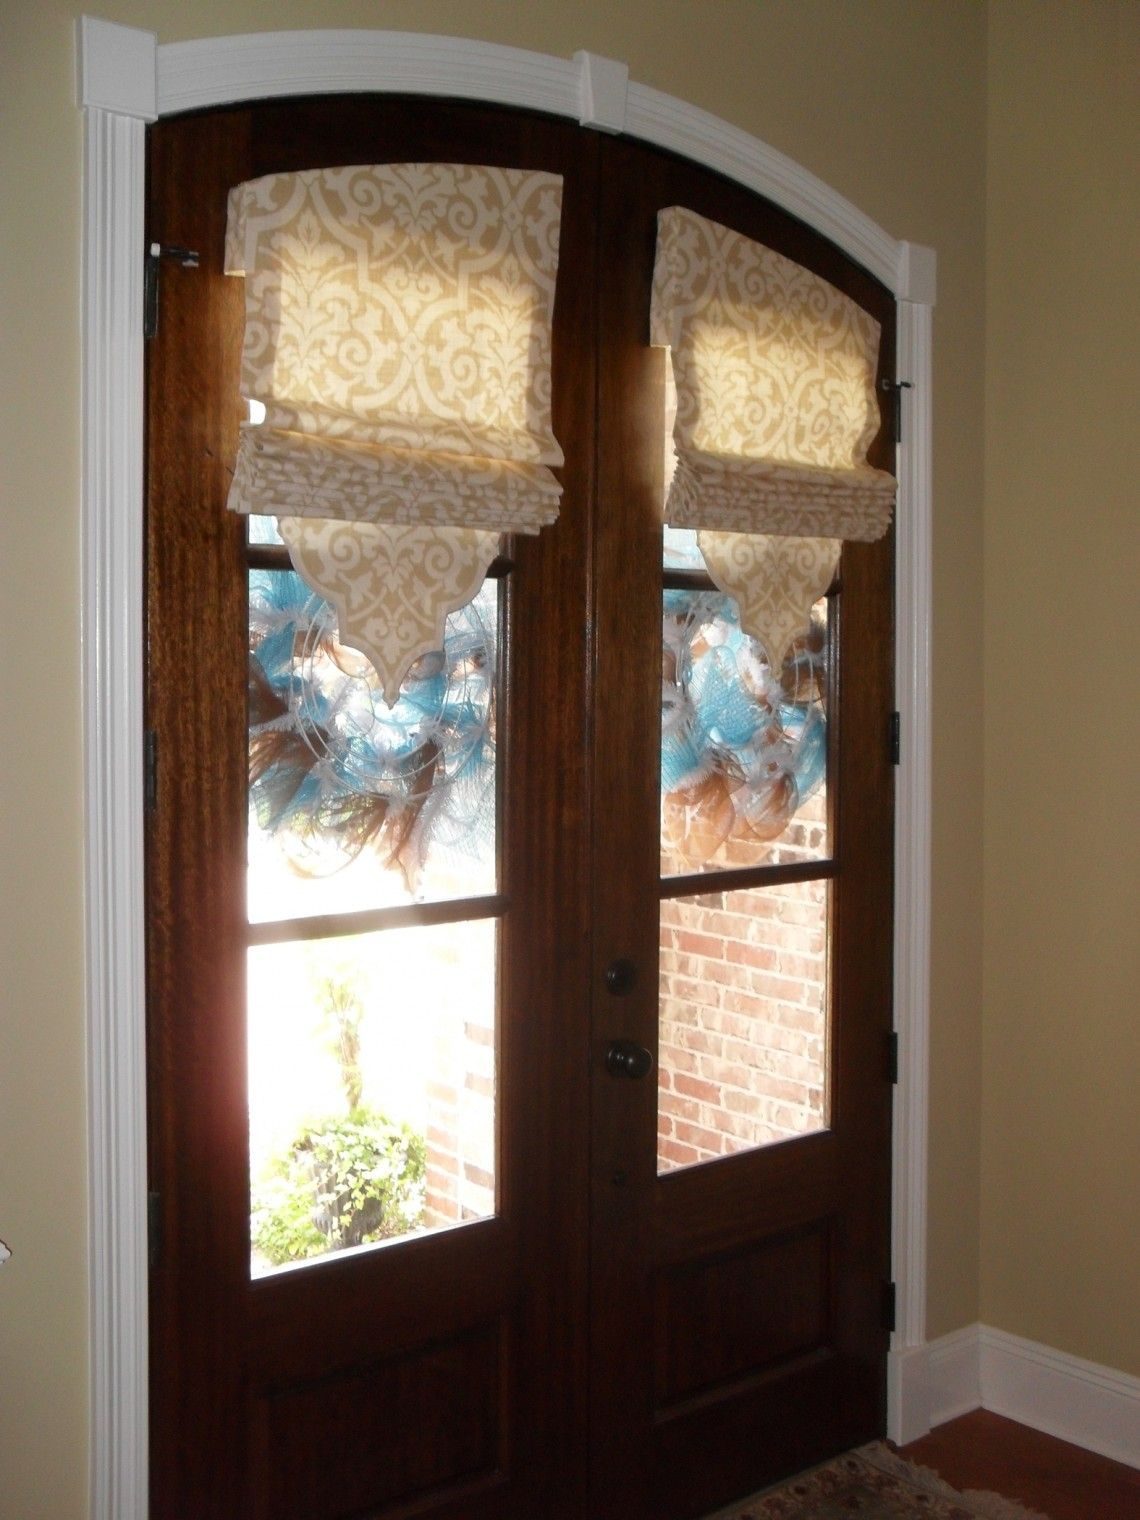 Accessory door with cordless roman shades design for front door window blinds